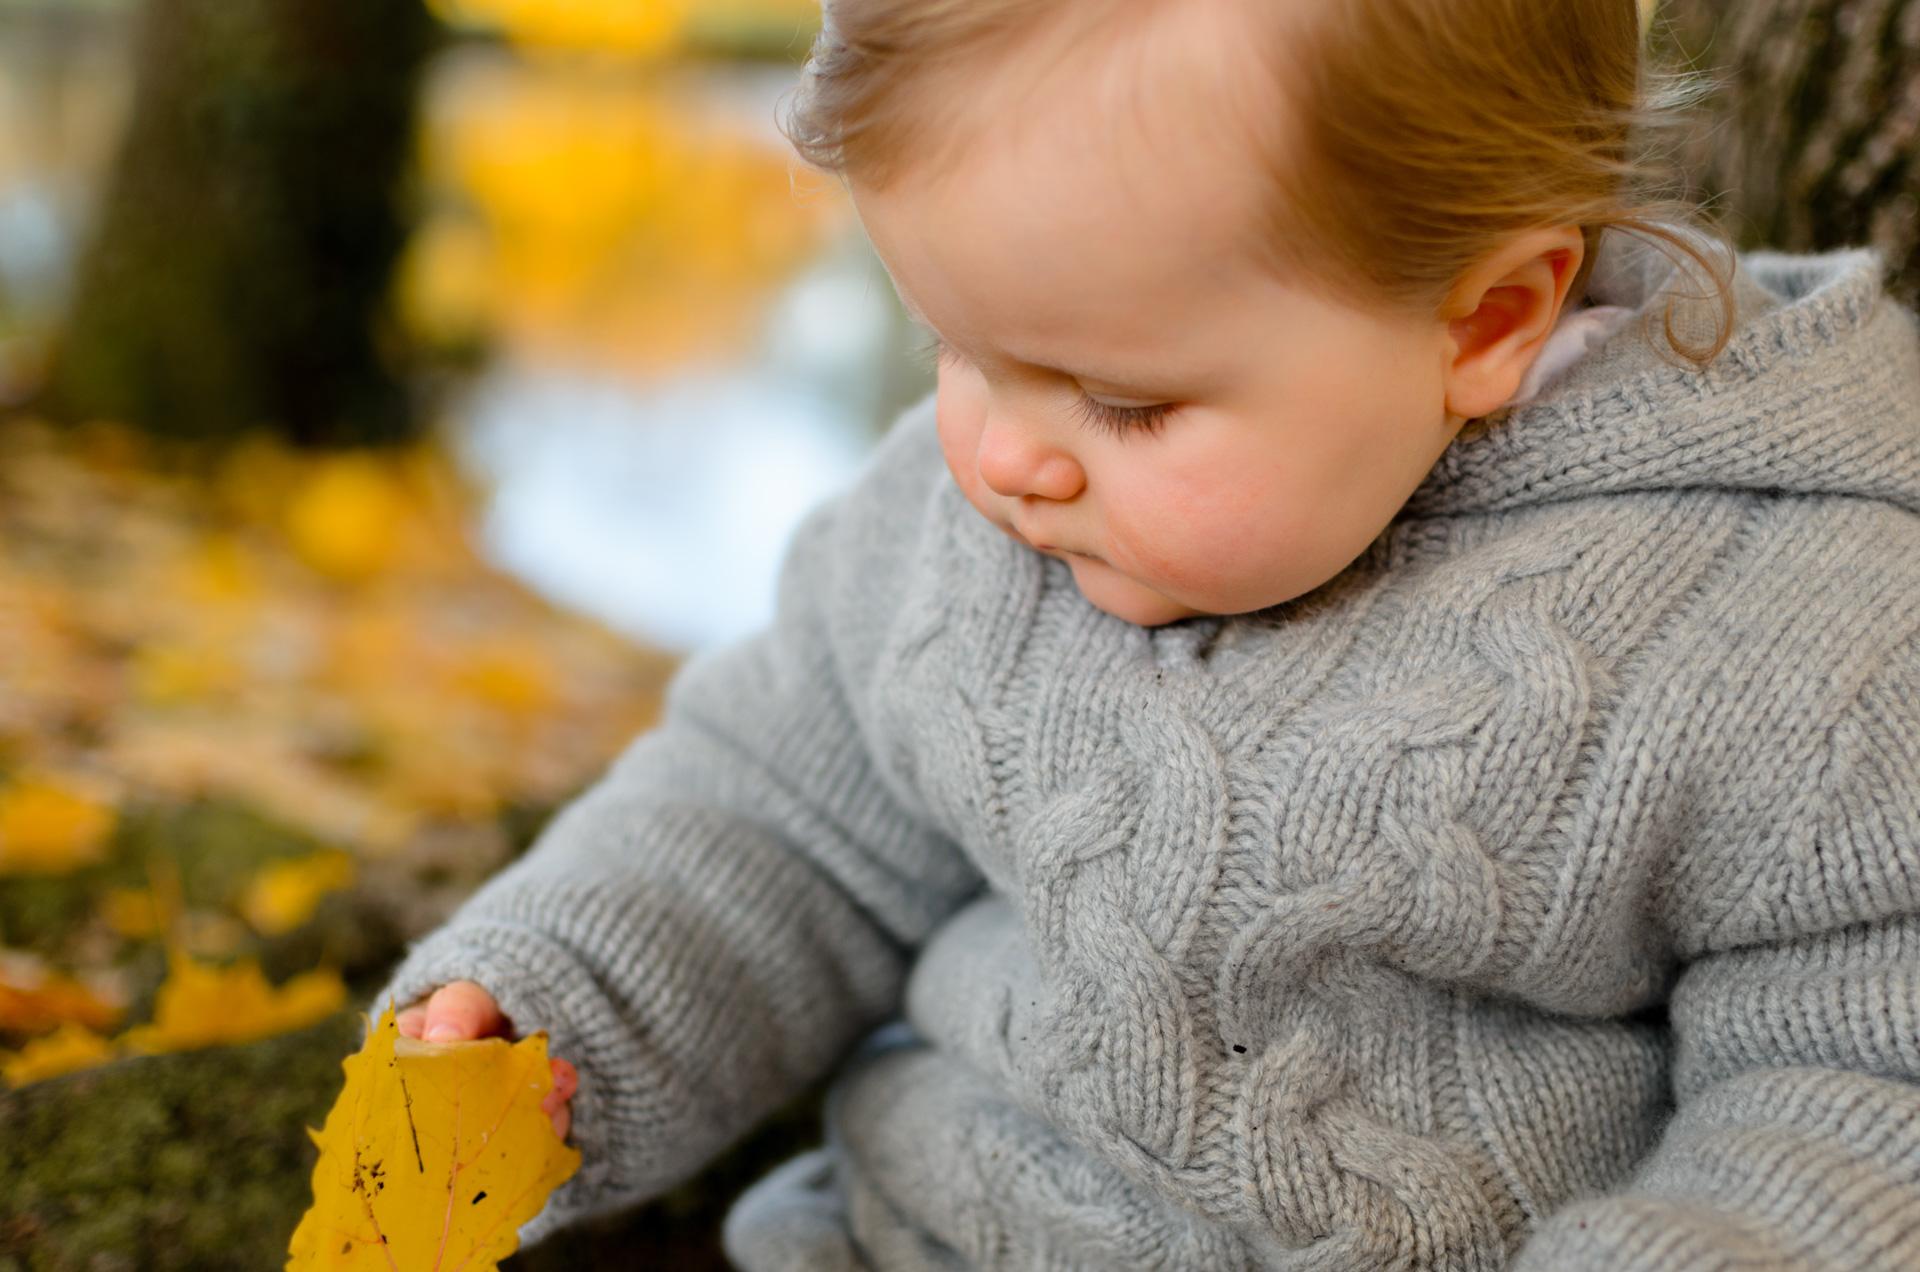 Photographe lifestyle séance Yvelines automne Vésinet Chatou bébé famille sandrine siryani